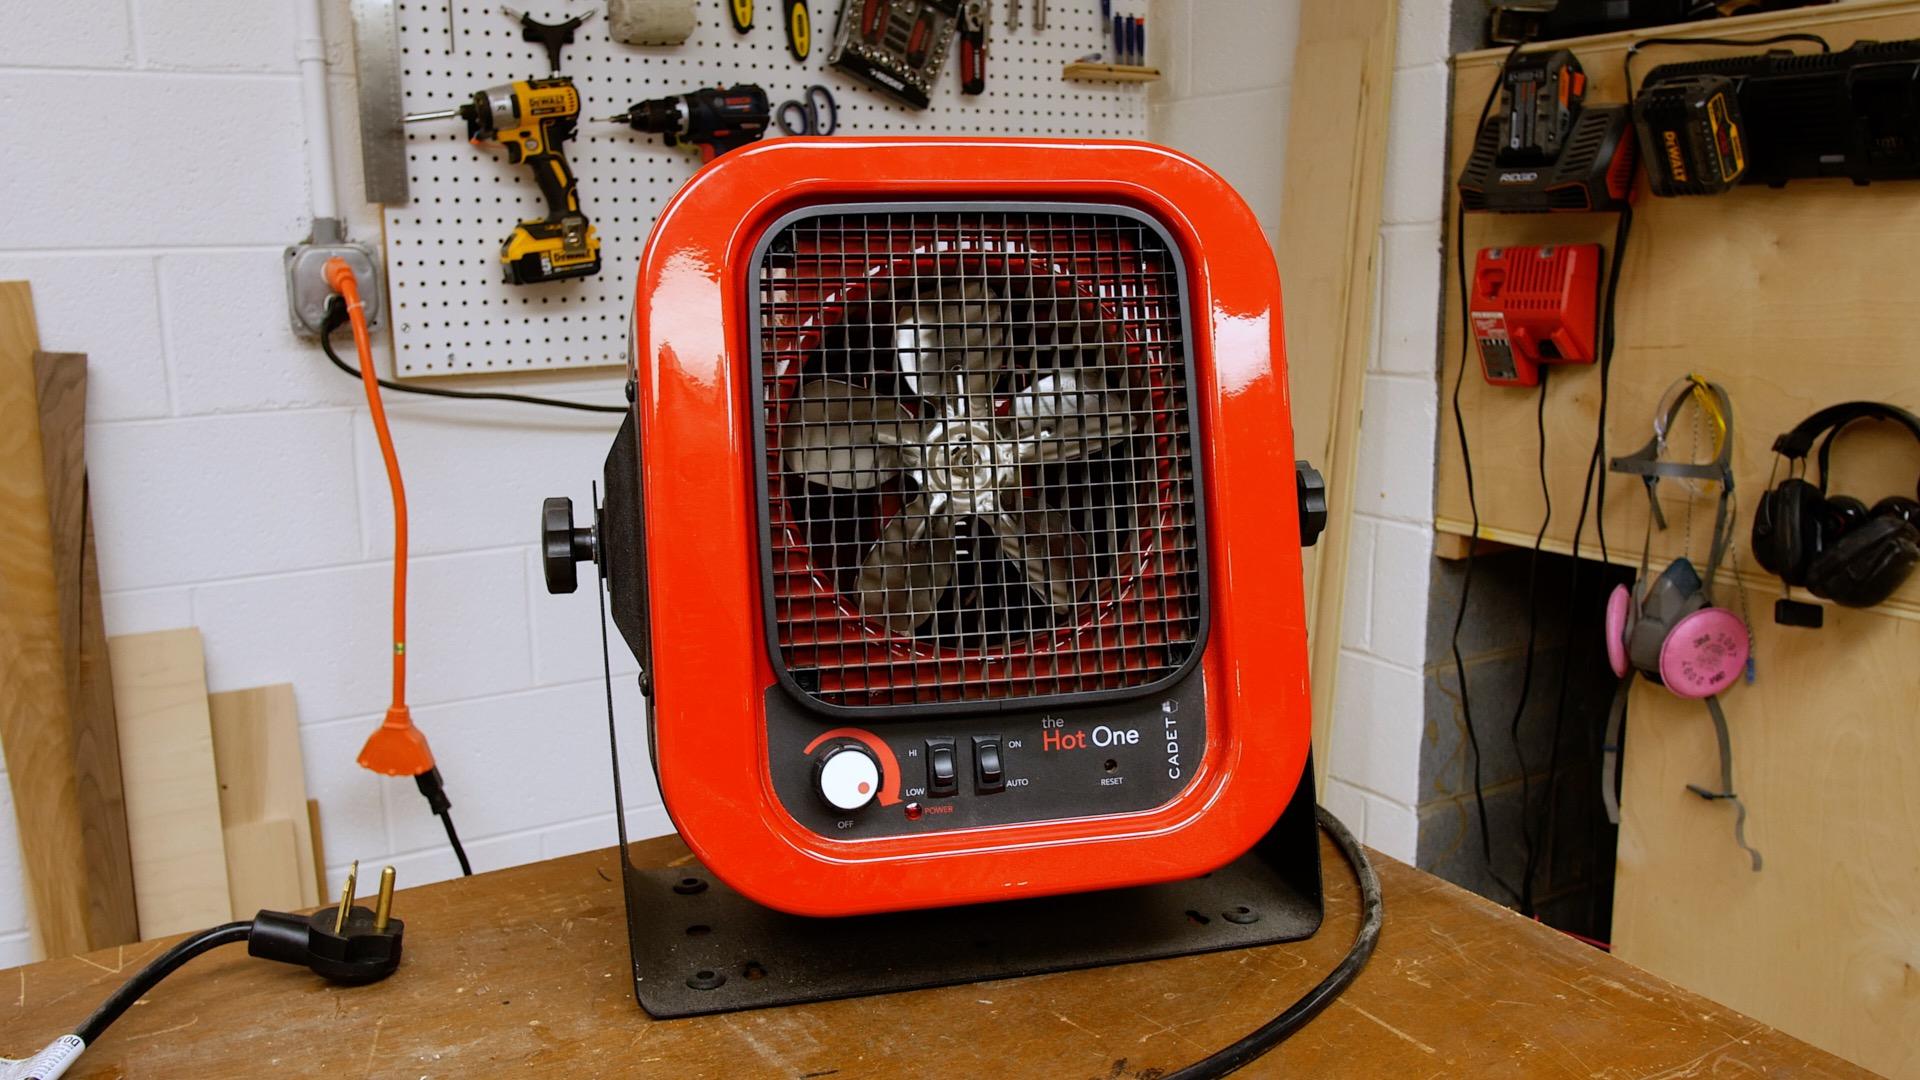 cadet the hot one garage shop basement electric heater heating